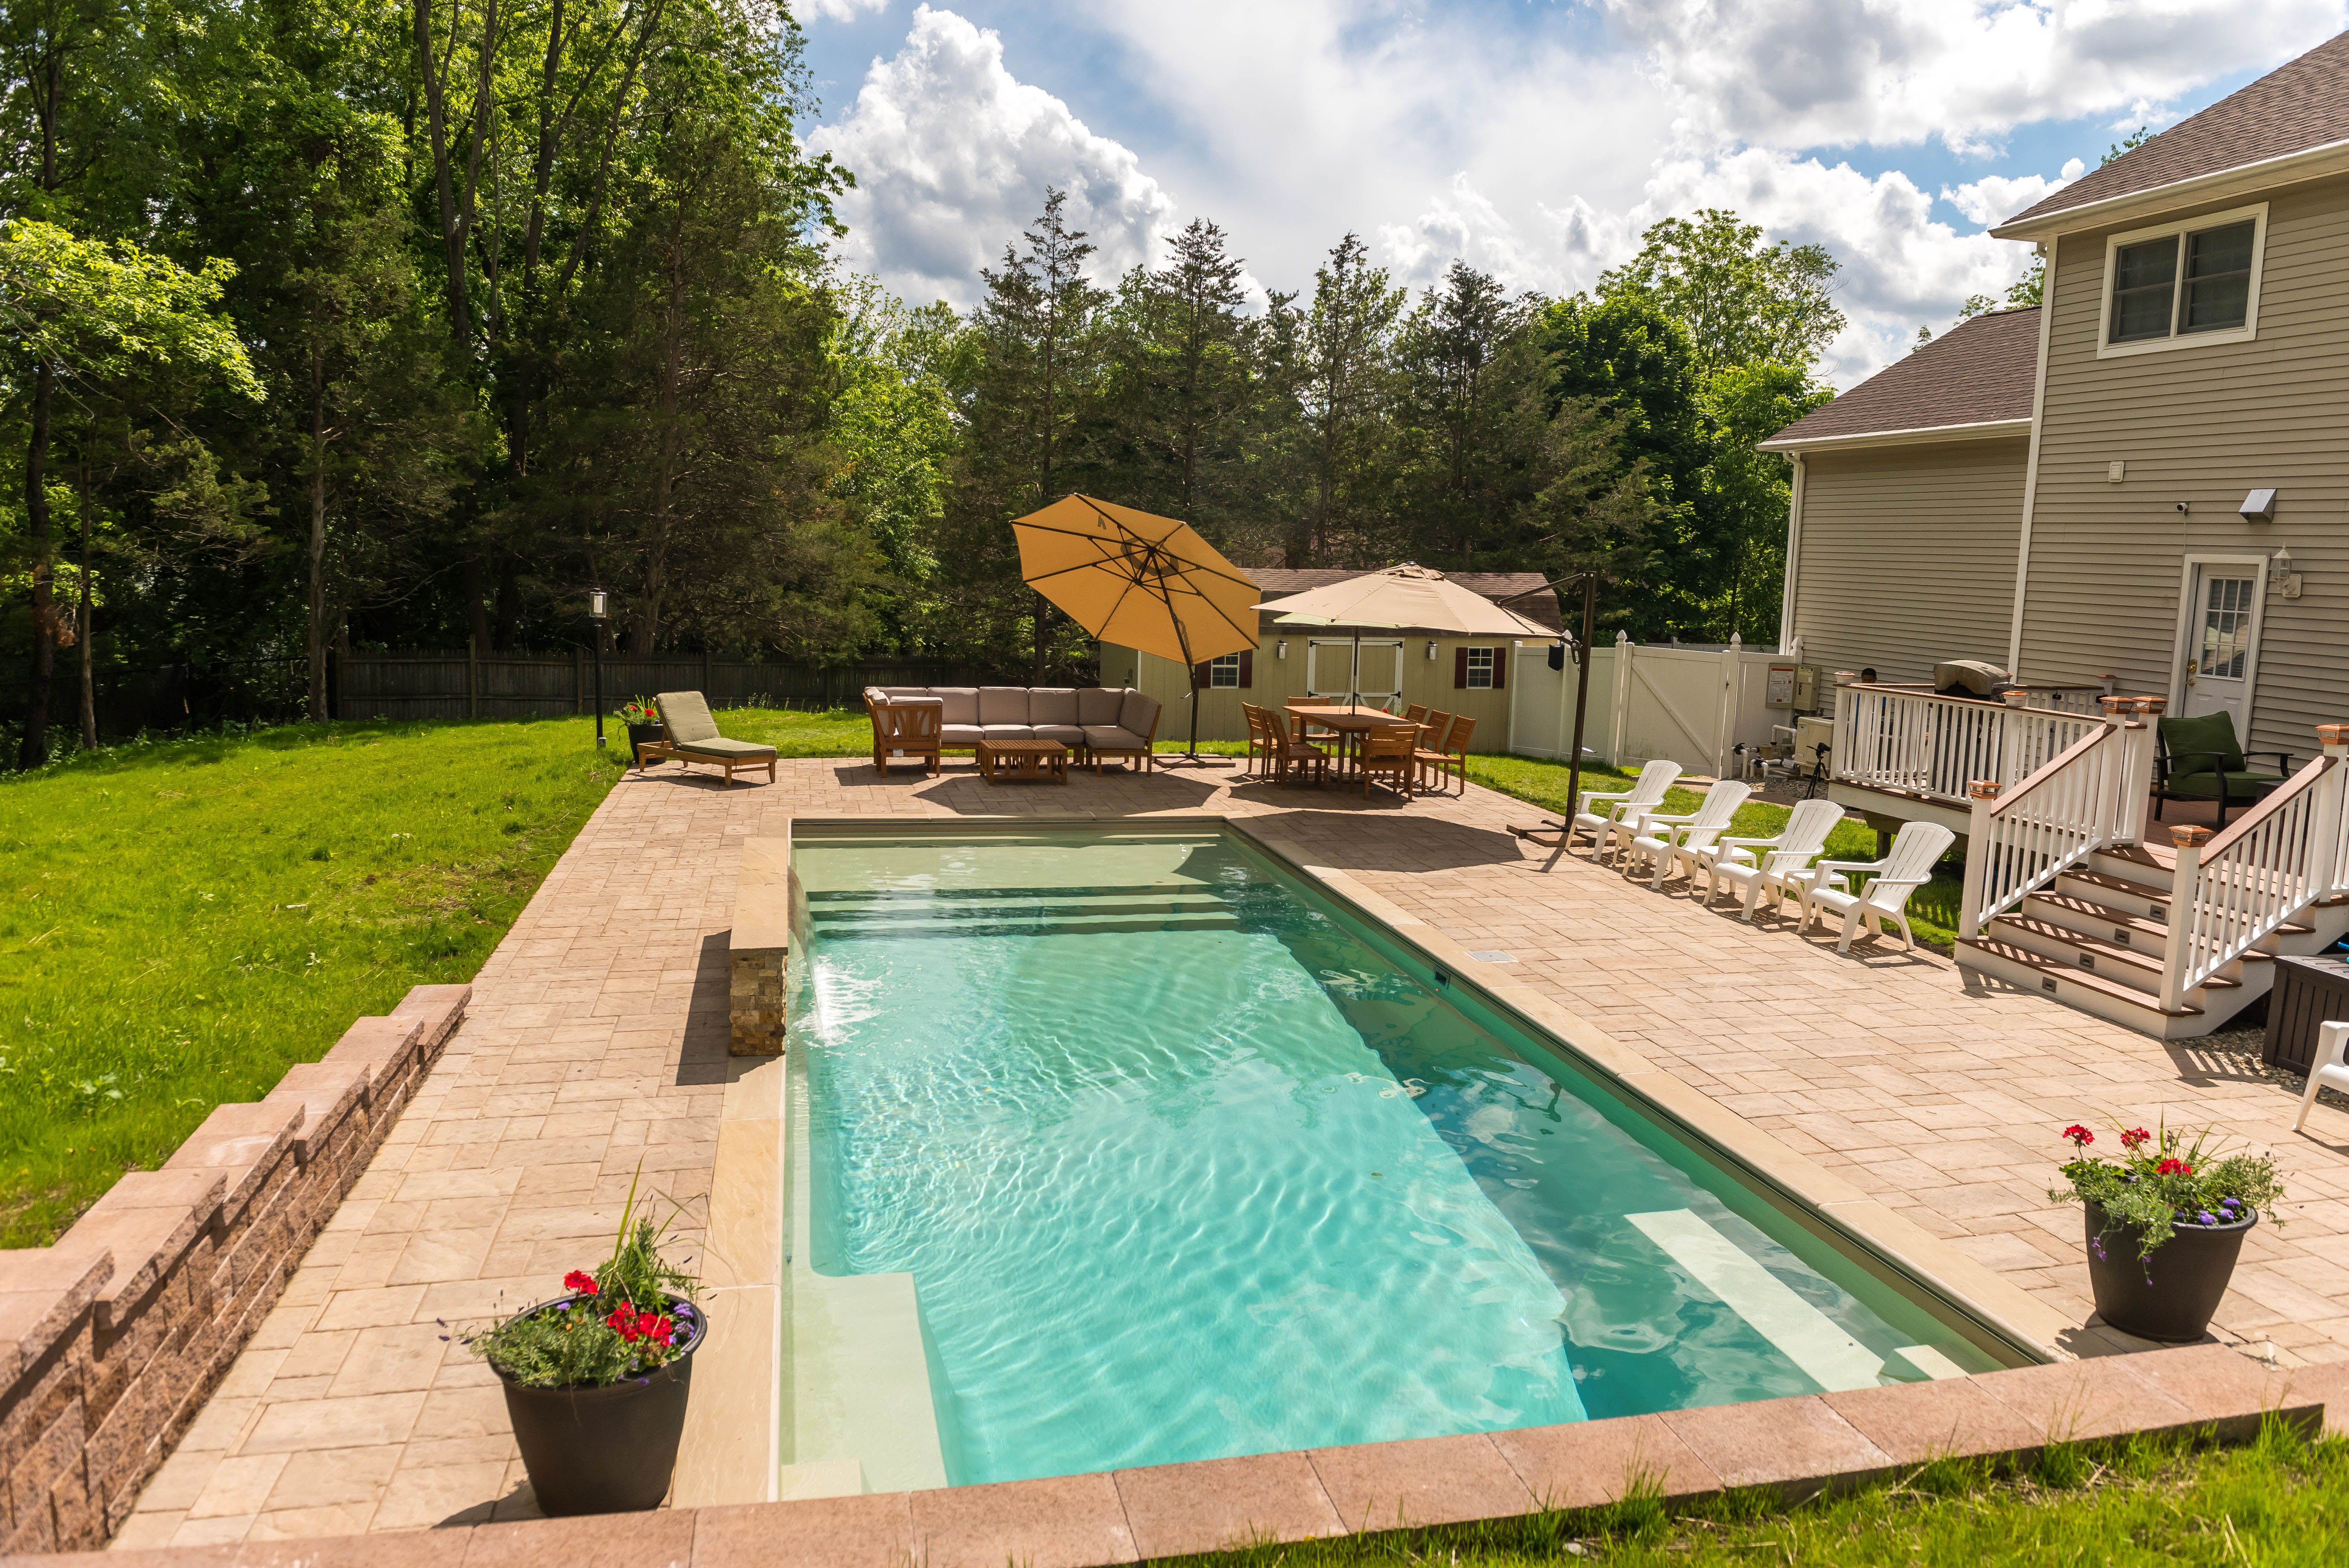 Leisure Pools The Pinnacle Backyard Vacation Leisure Pools Pool Designs